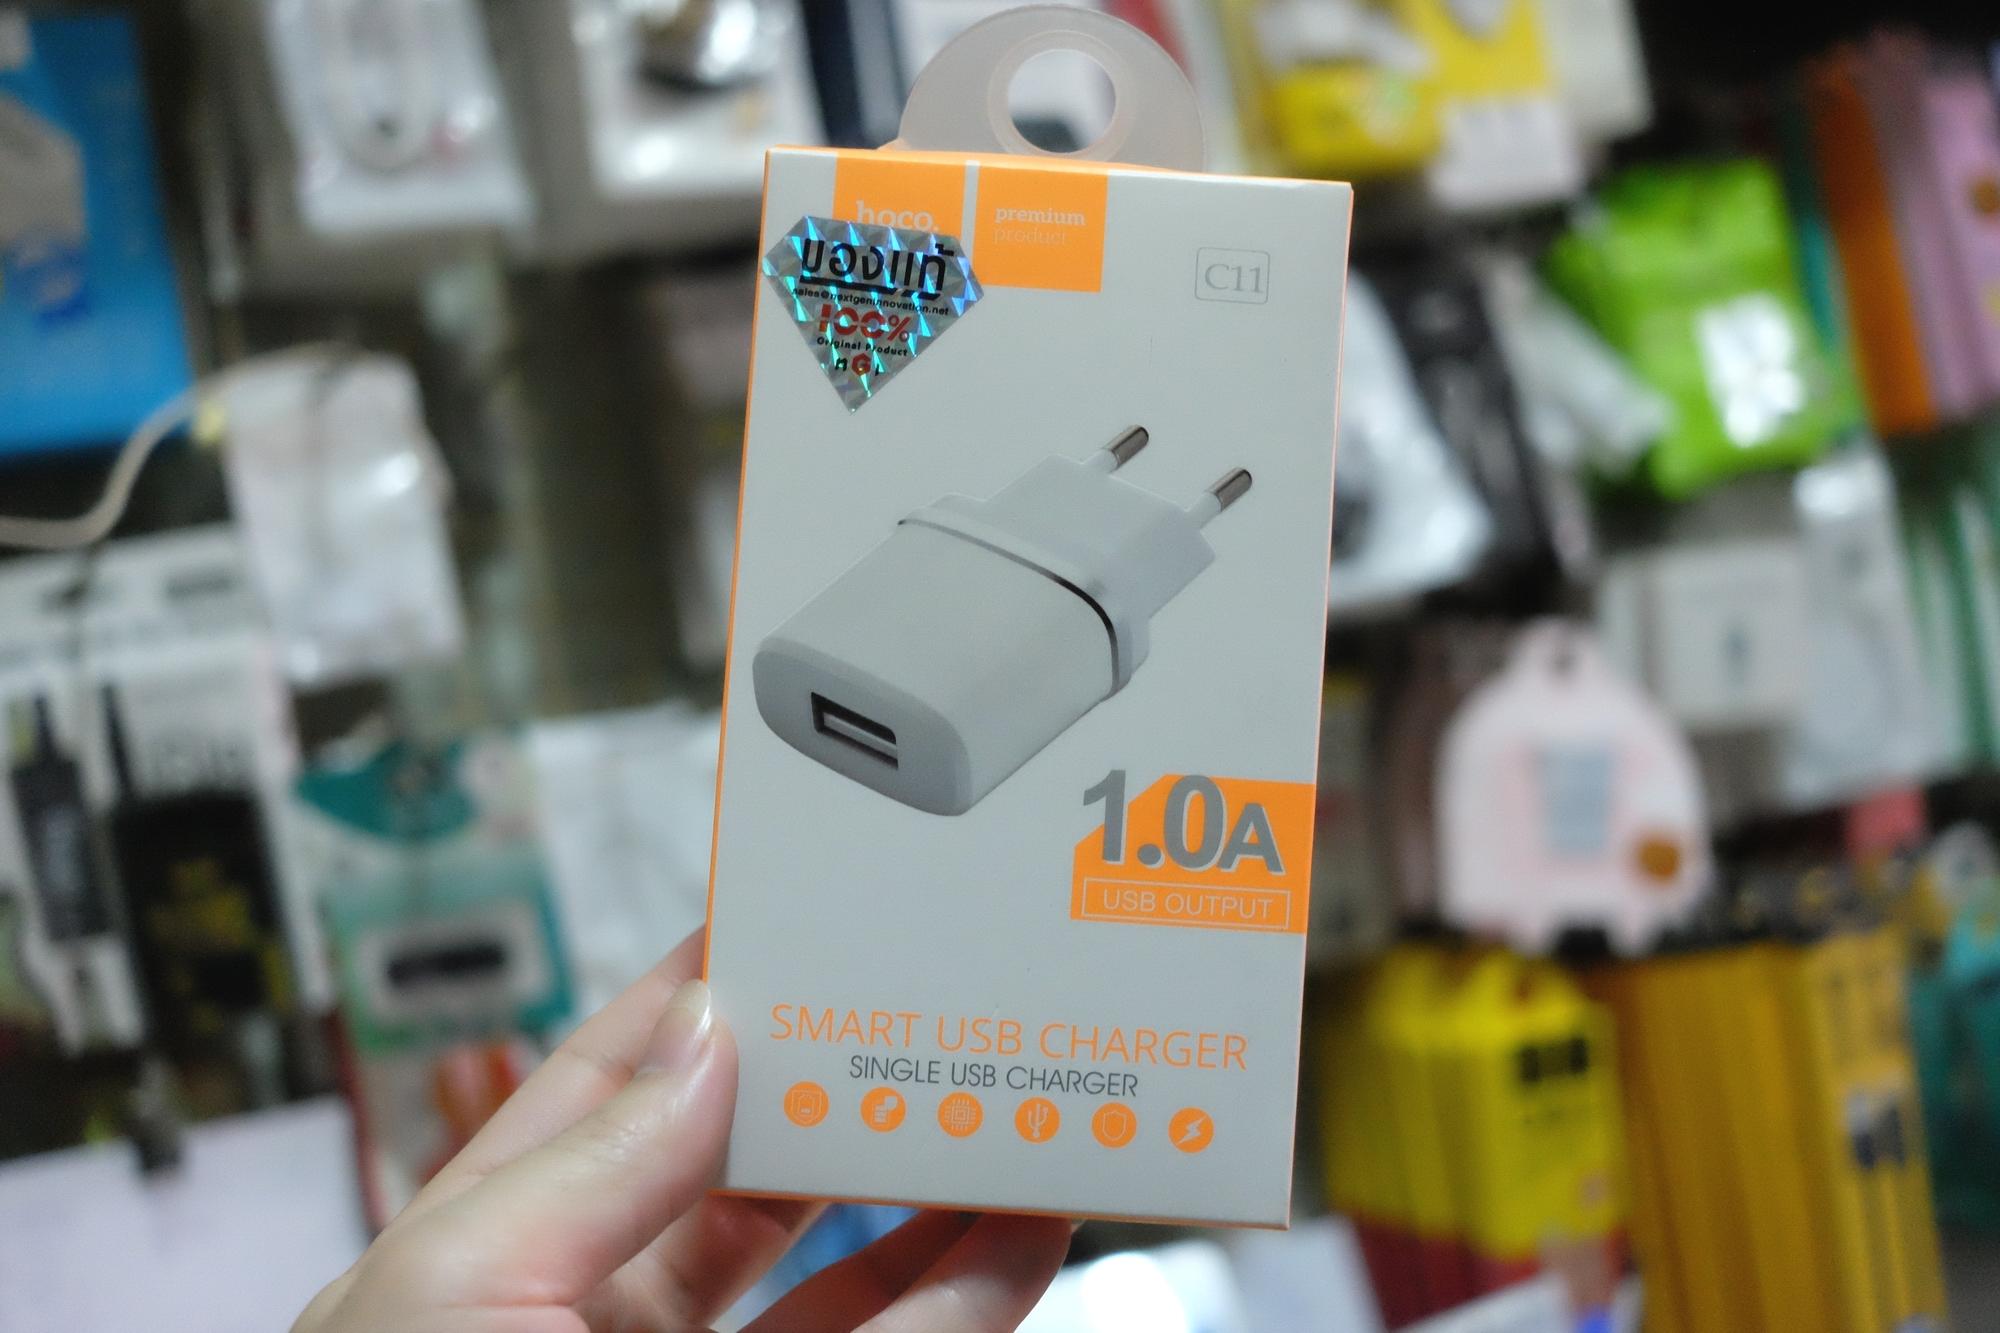 HOCO C11 Adapter 1A มีไฟสีฟ้าตรงช่อง USB